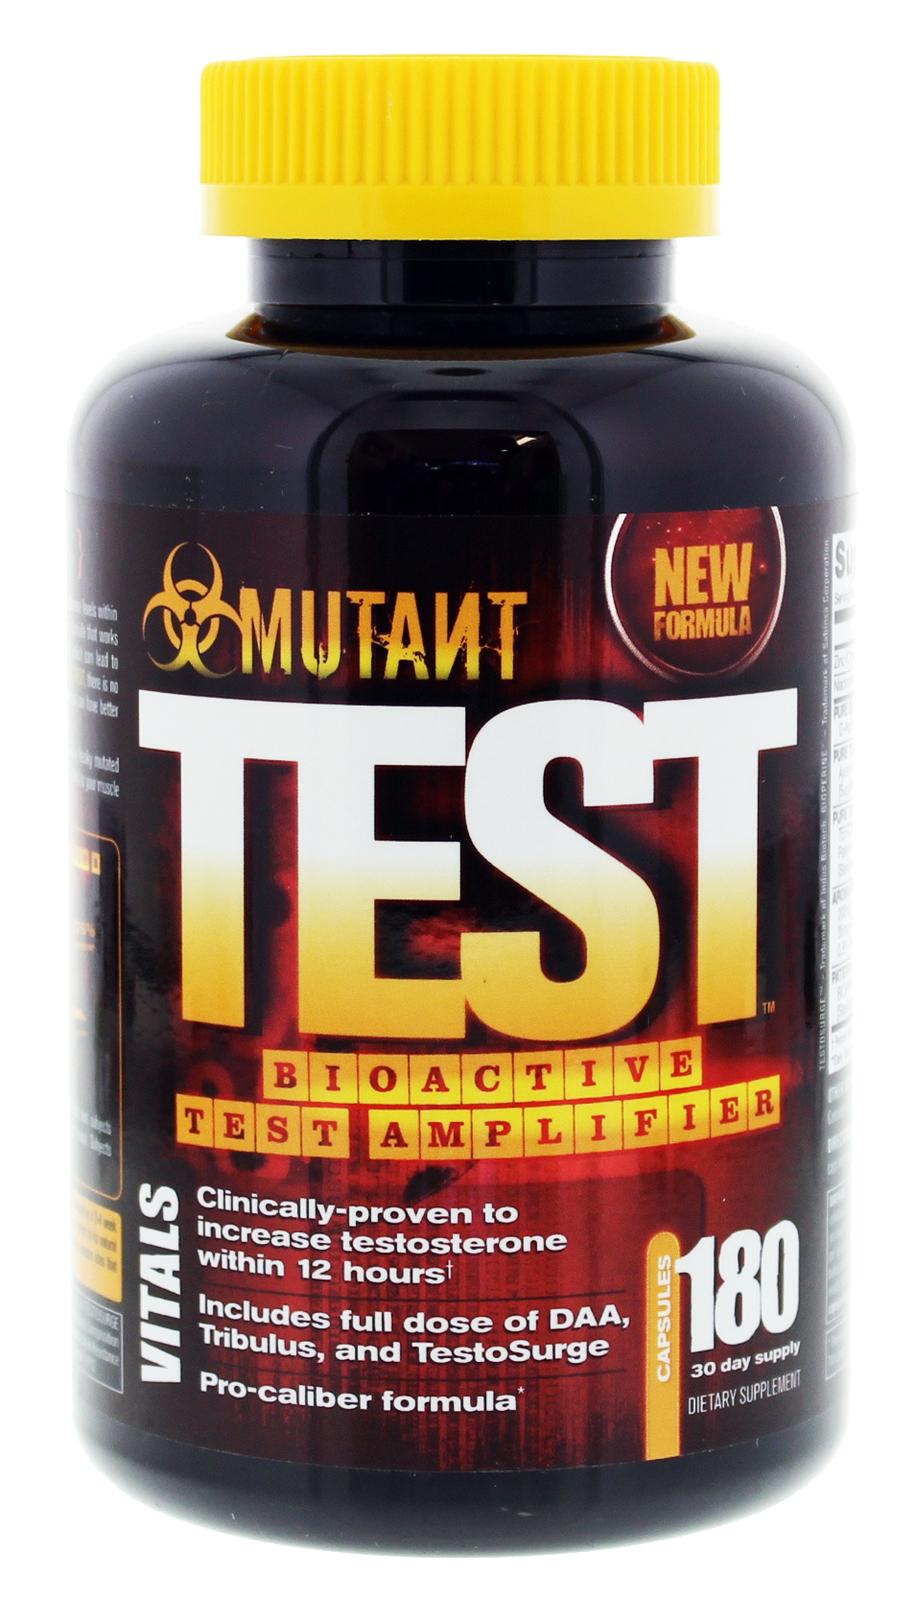 Mutant Test (180 Tablets) image